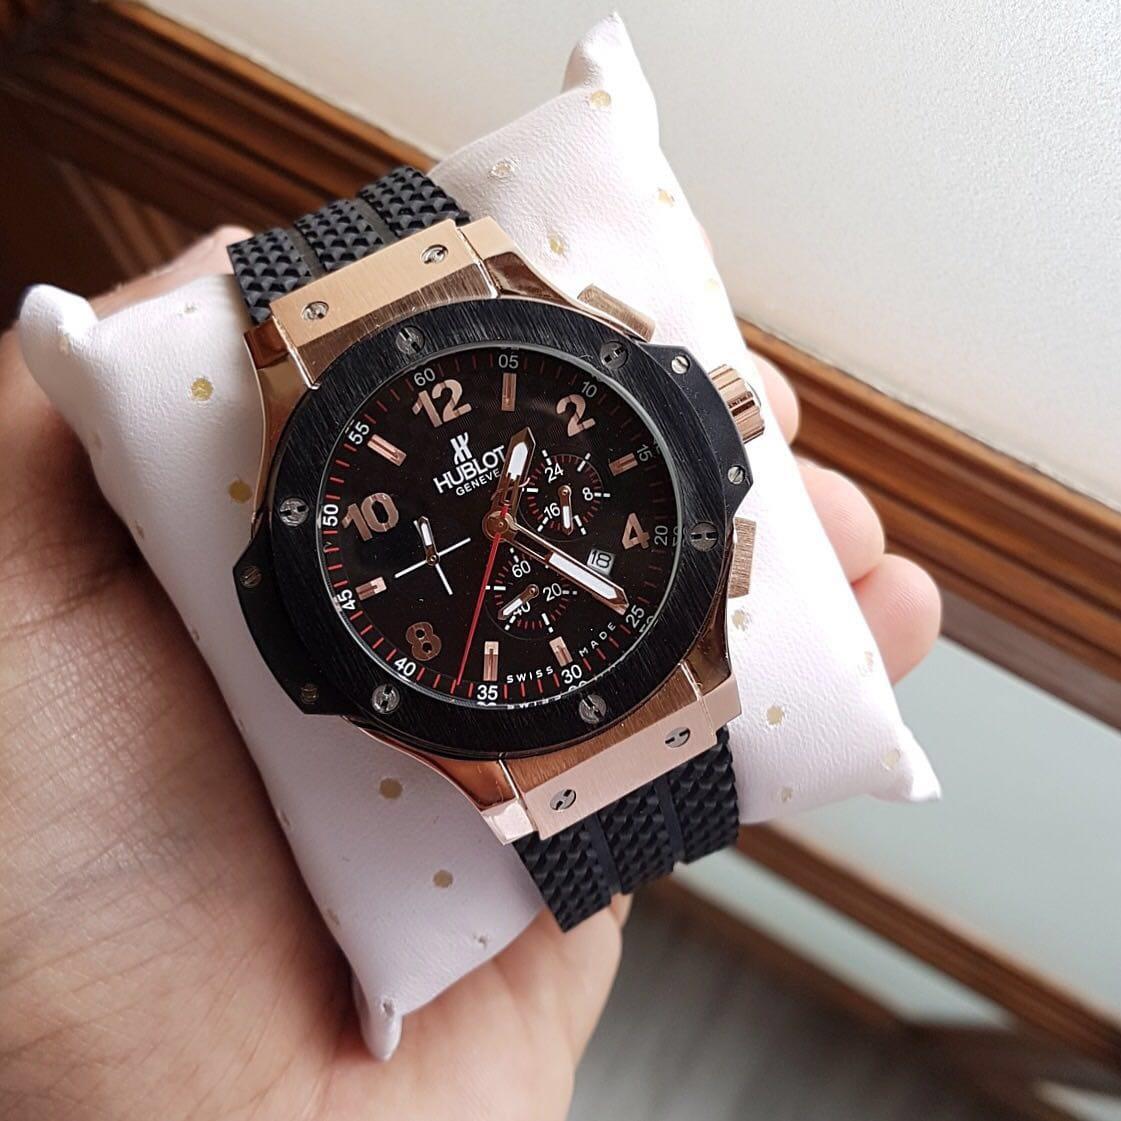 452c0ef23aa1 Hugo Boss Watches-Hugo boss first copy watches, branded fake watches, Hugo  boss t-shirt first copy, master copy watches.